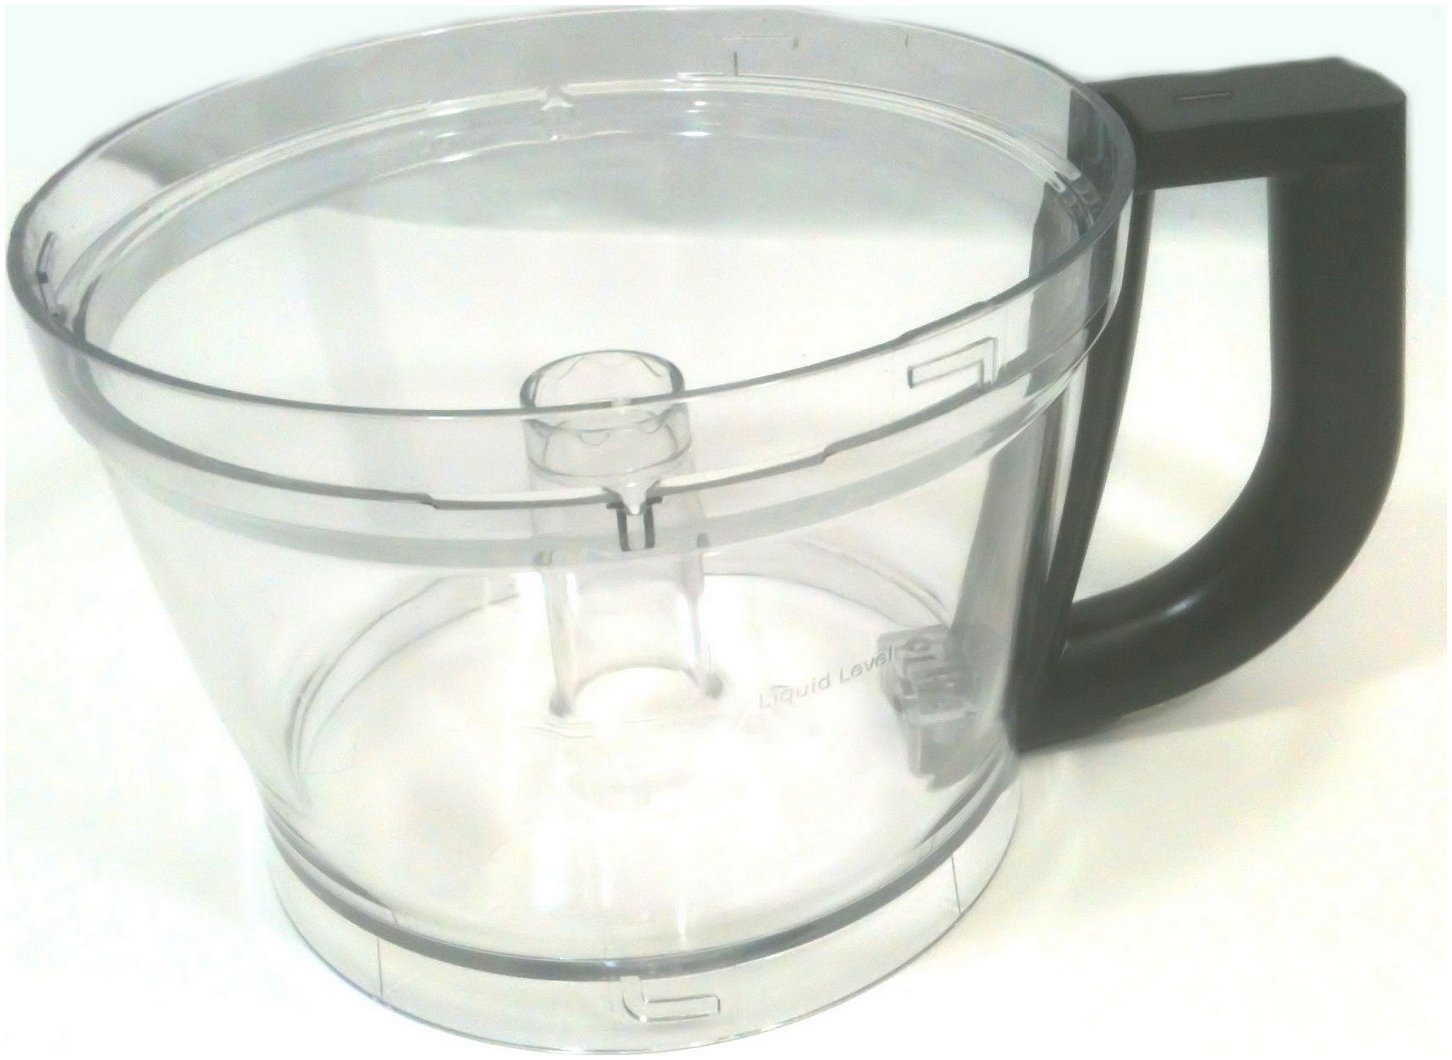 Kitchenaid Replacement Work Bowl (large) W/black Handle, For Kfp1333 - KFP13WBOB